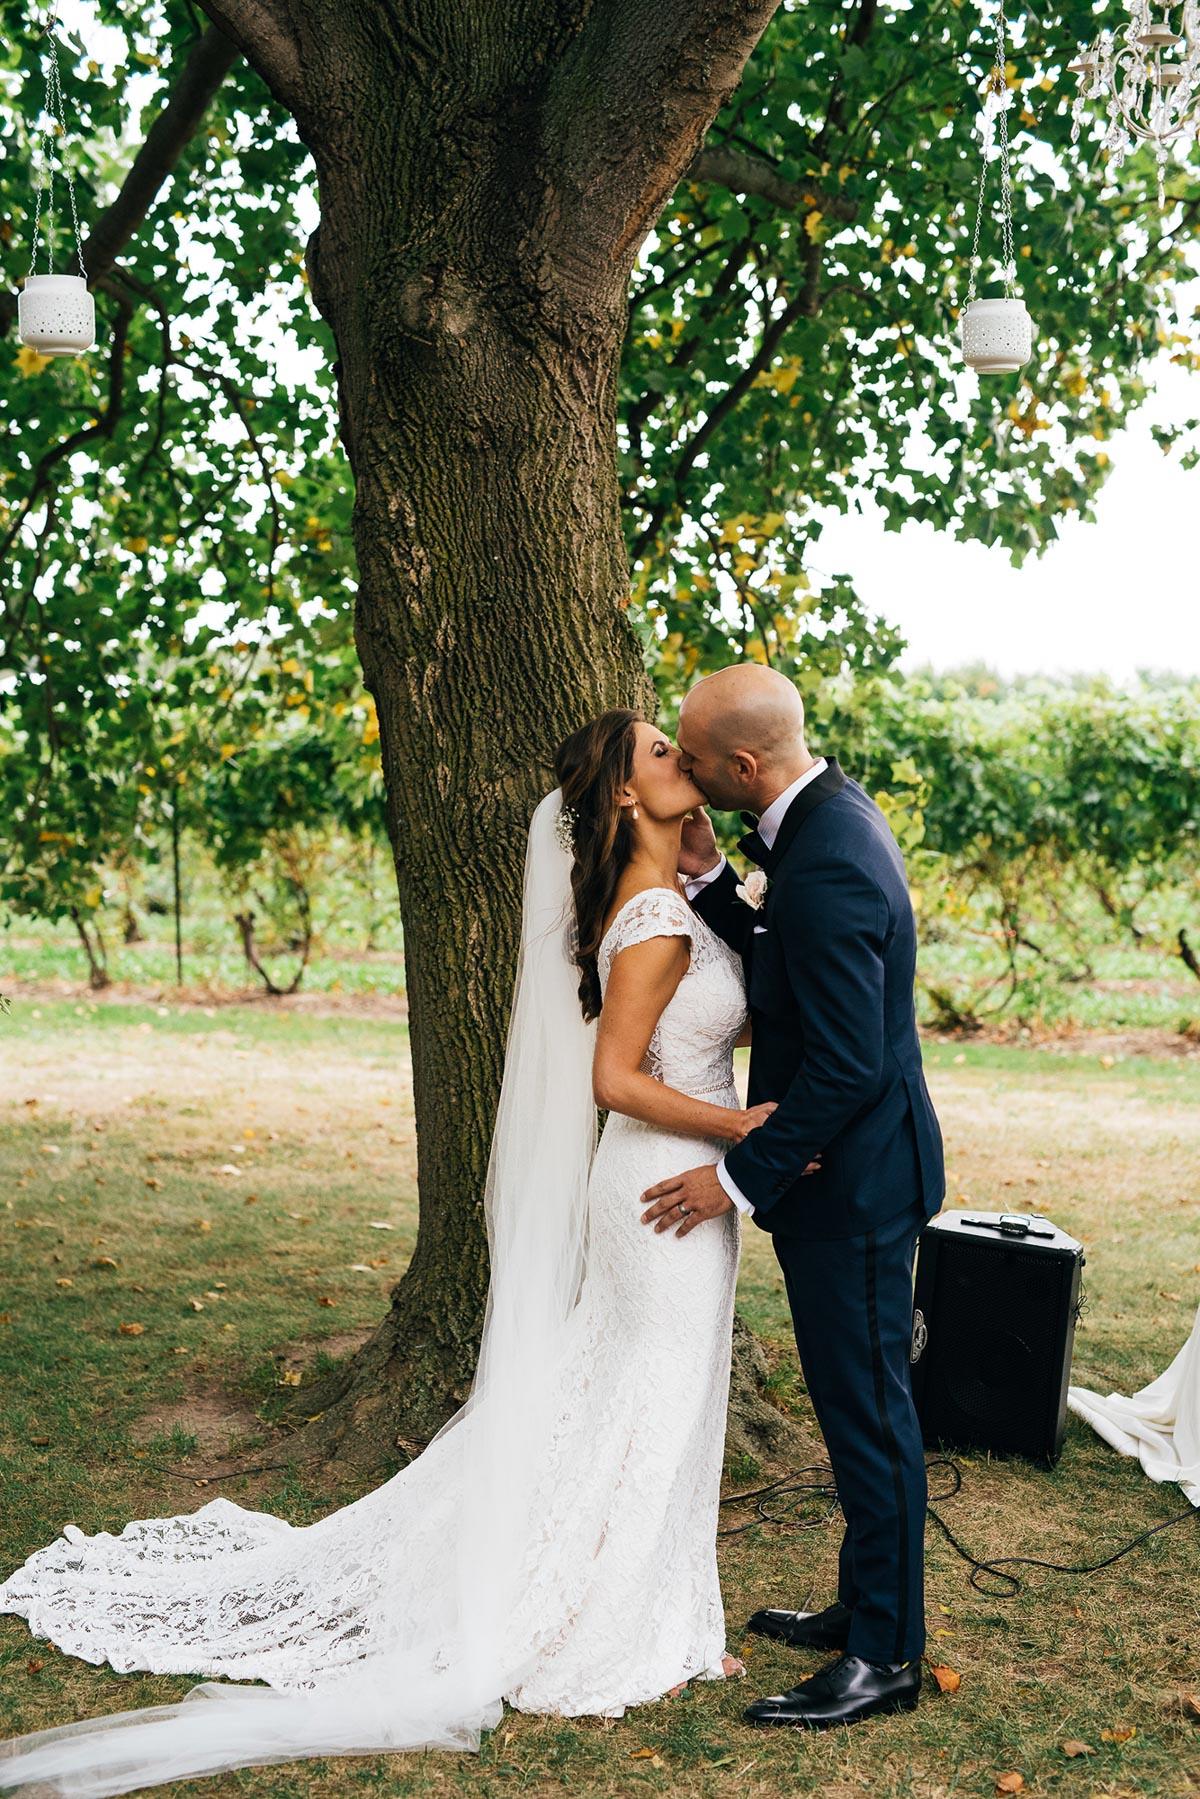 shaw-events-vineyard-bride-swish-list-kurtz-orchards-niagara-on-the-lake-wedding-81.jpg